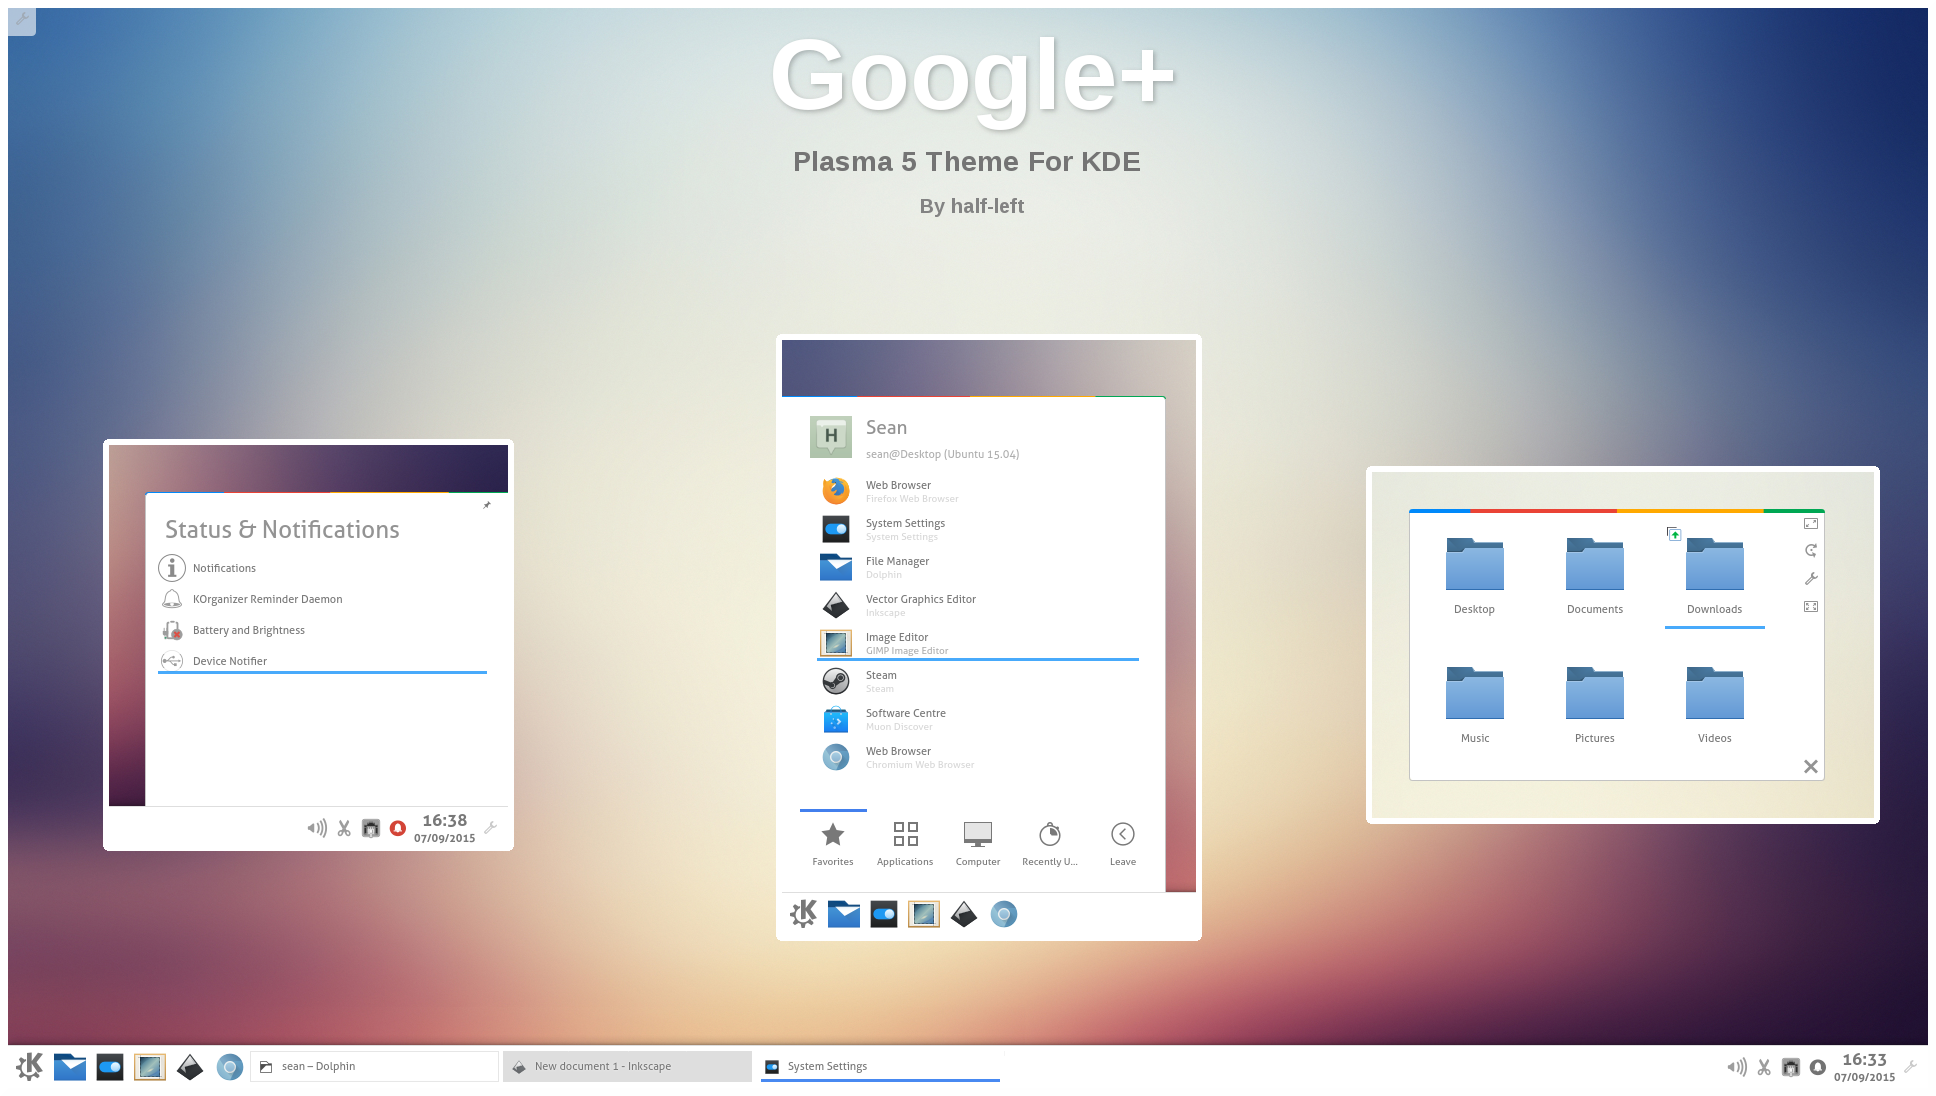 Google theme kde -  Google For Plasma 5 By Half Left